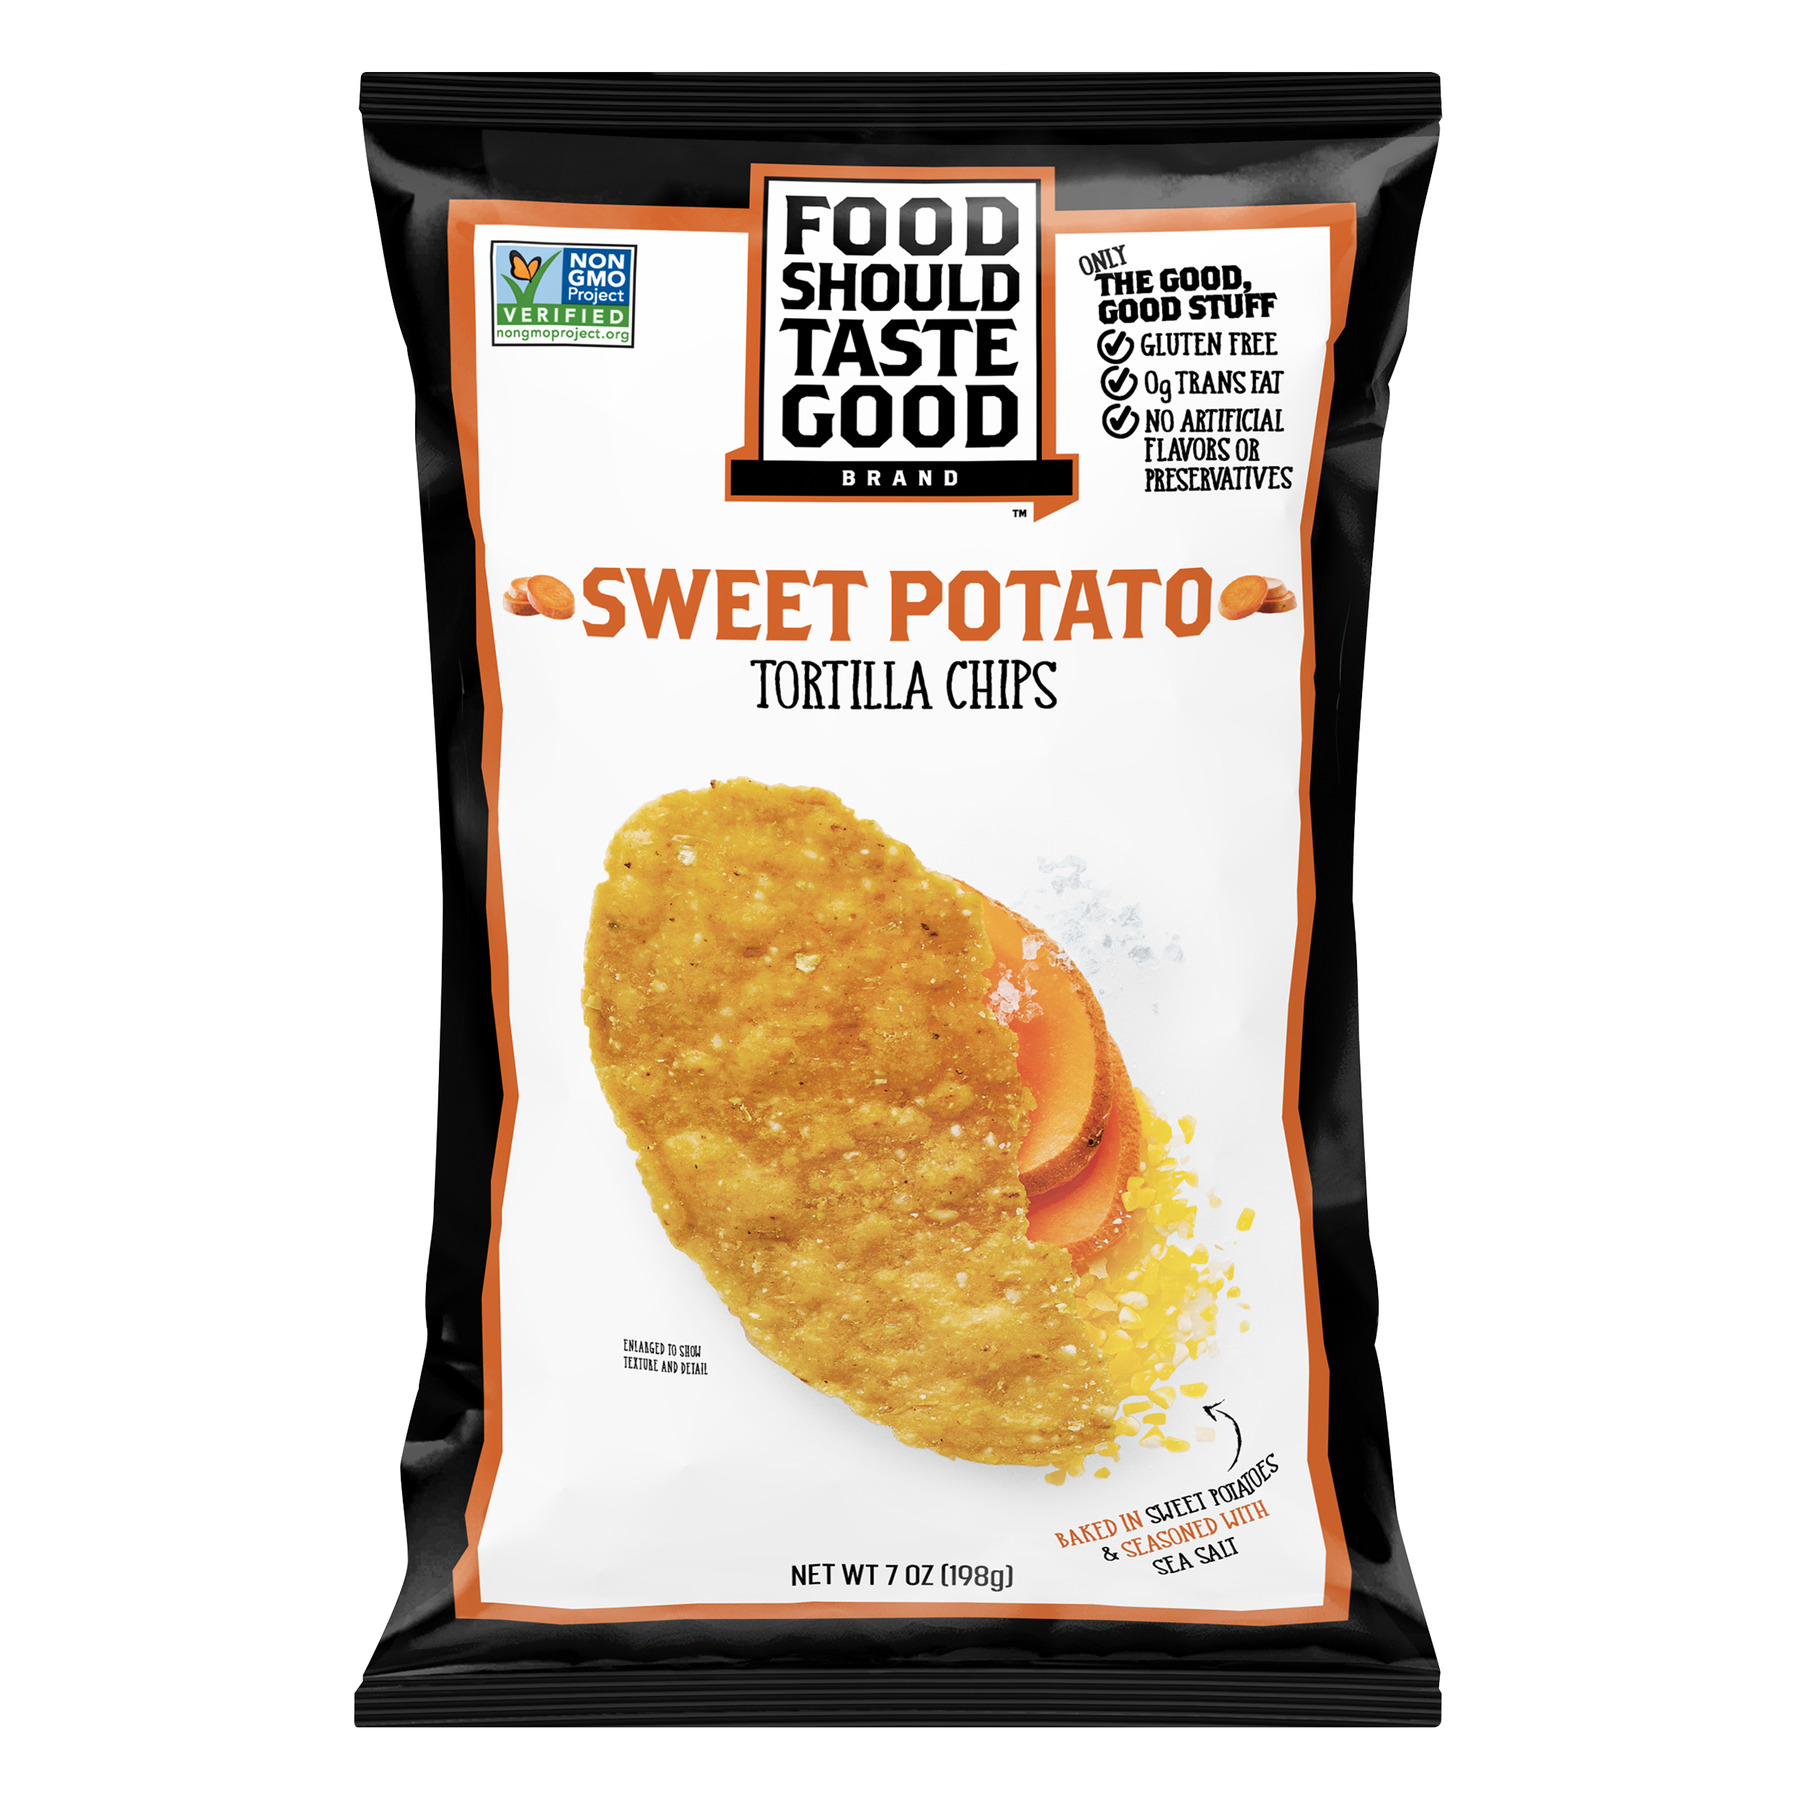 Food Should Taste Good Sweet Potato Tortilla Chips, 7 oz